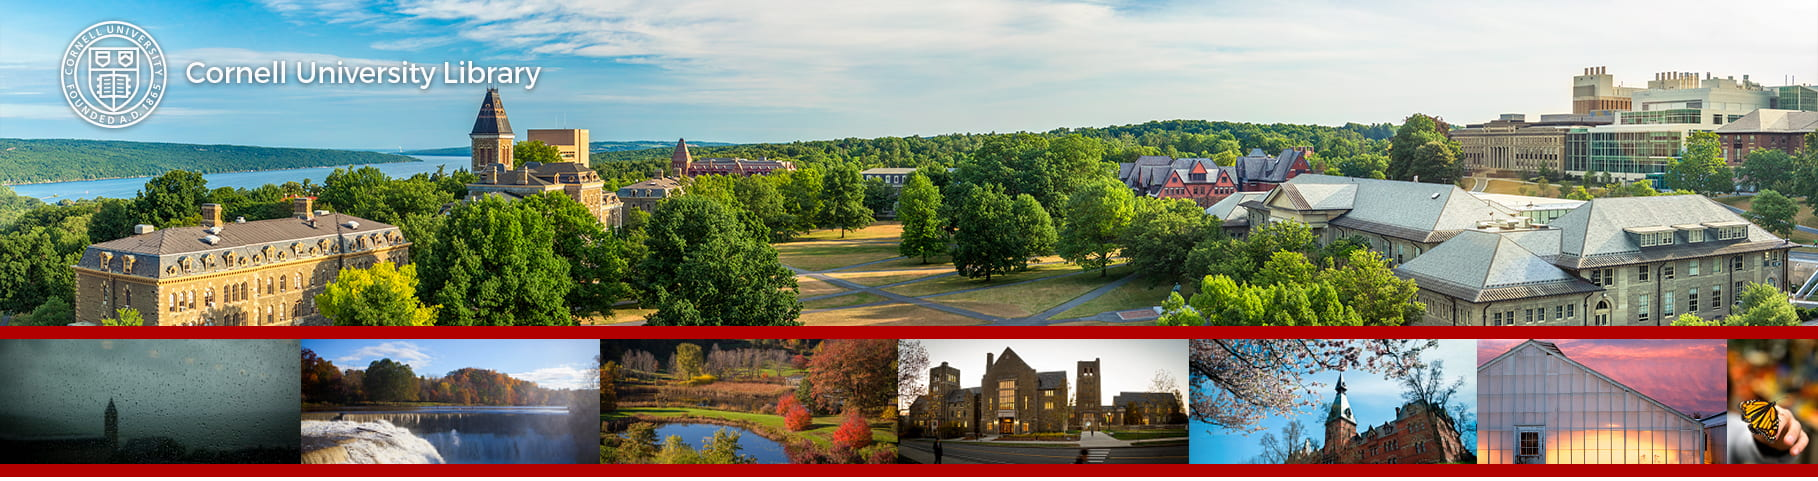 Cornell's Ithaca Campus